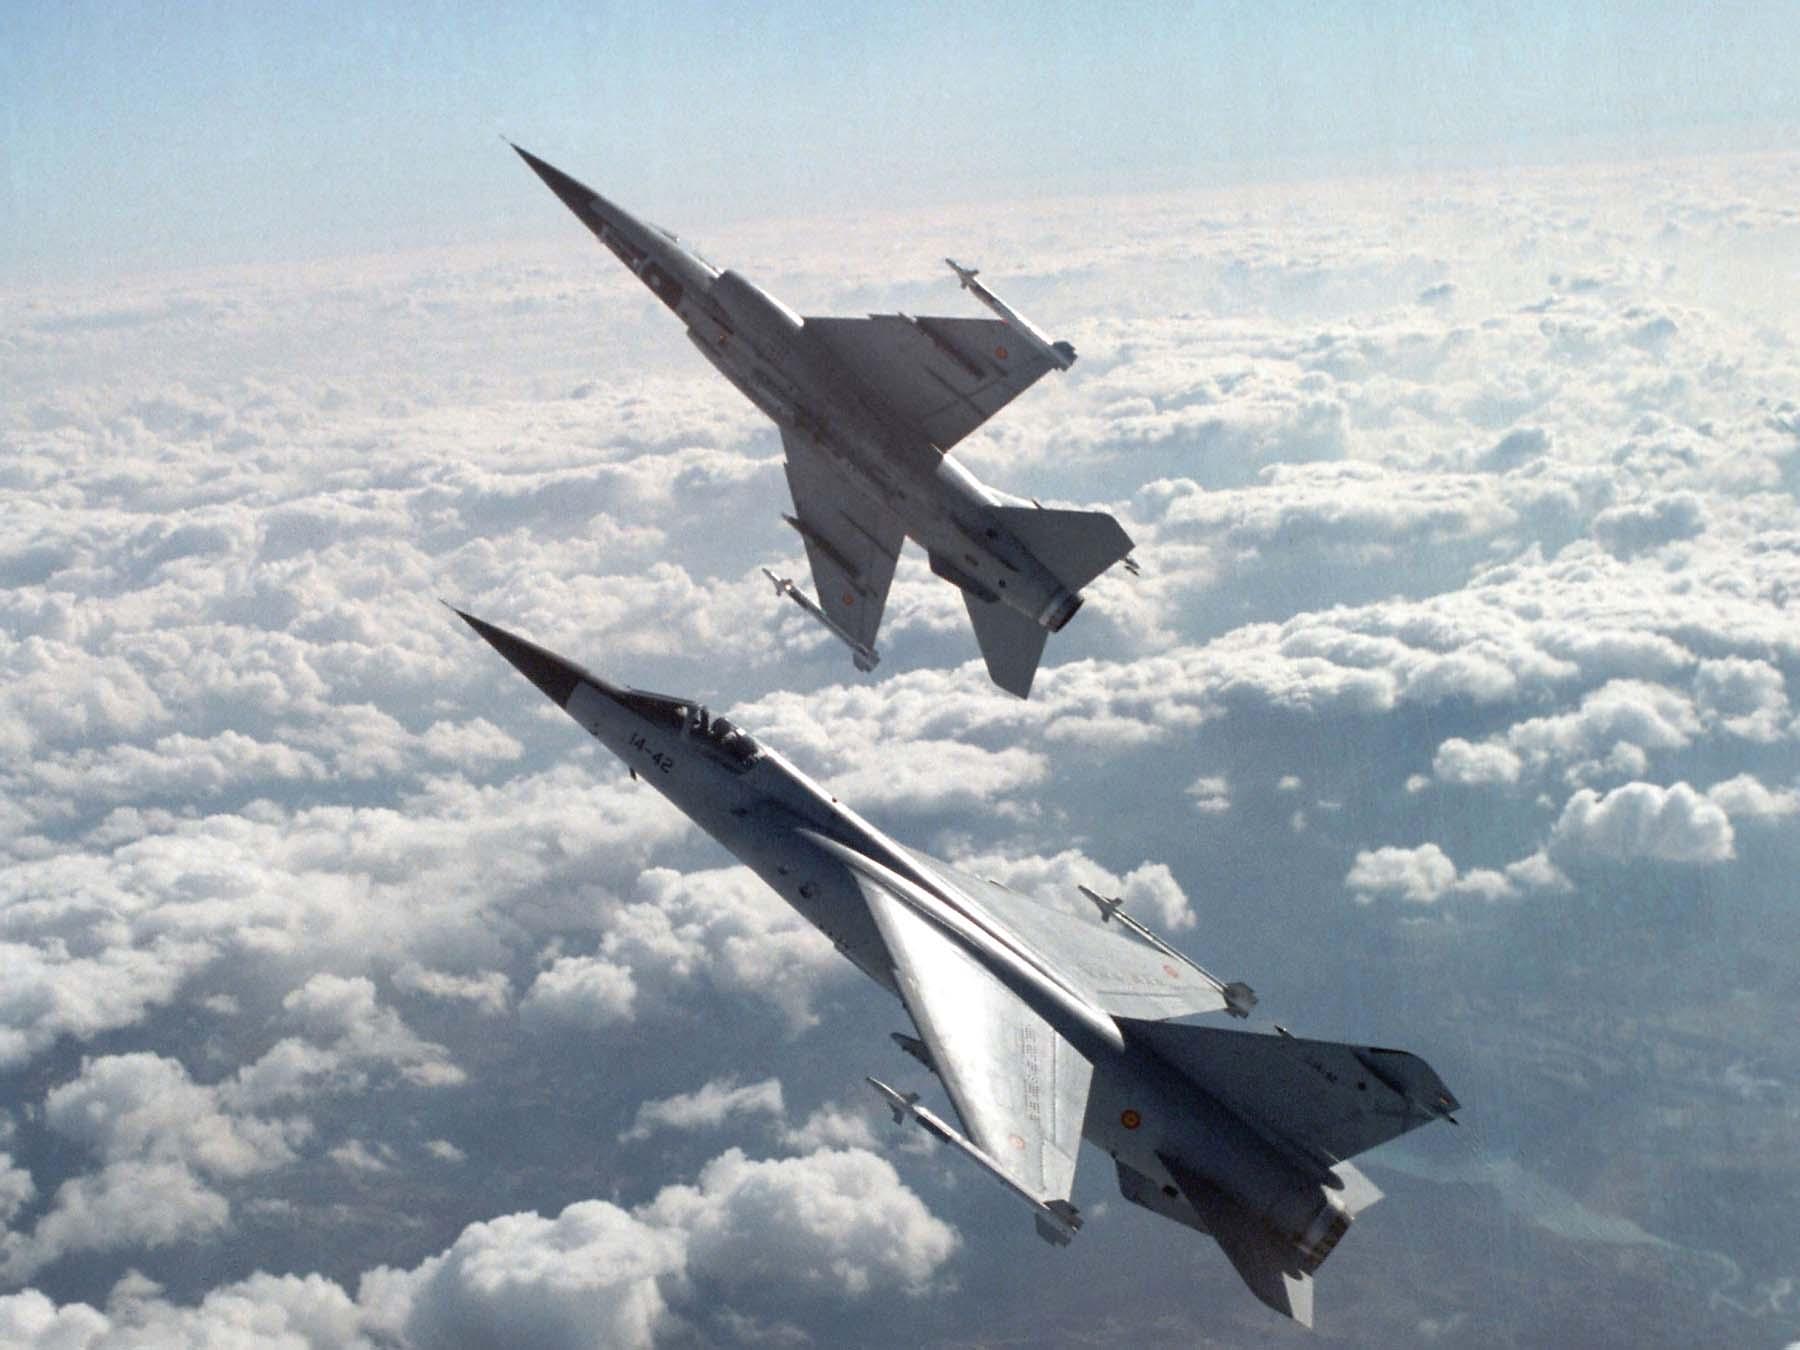 Mirage F1 - foto Força Aérea Espanhola - Ejercito del Aire